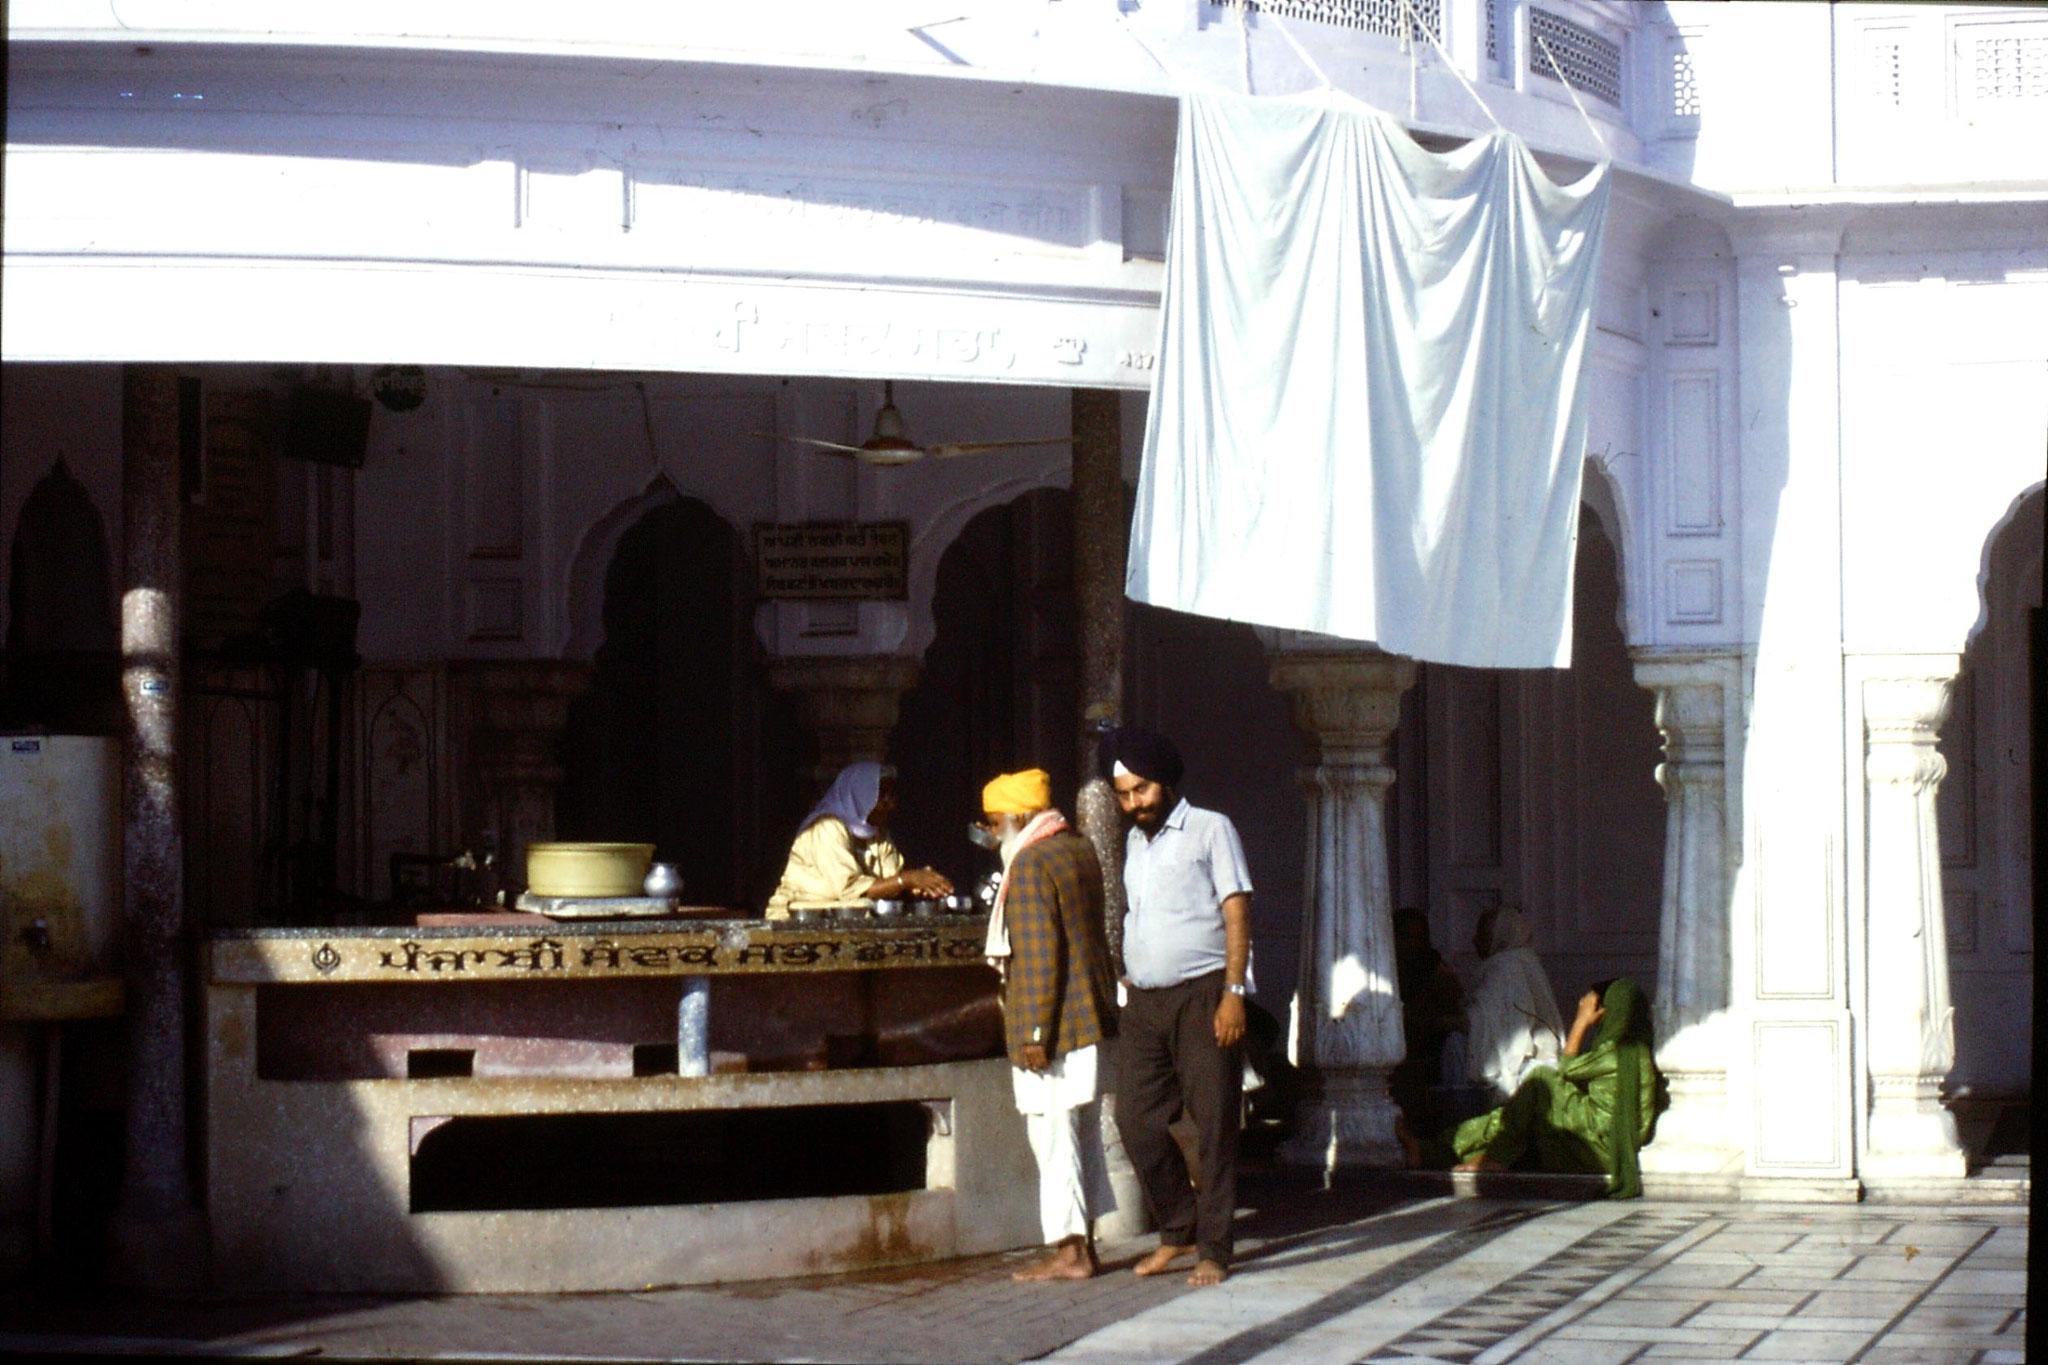 17/11/1989: 16: Amritsar Golden Temple